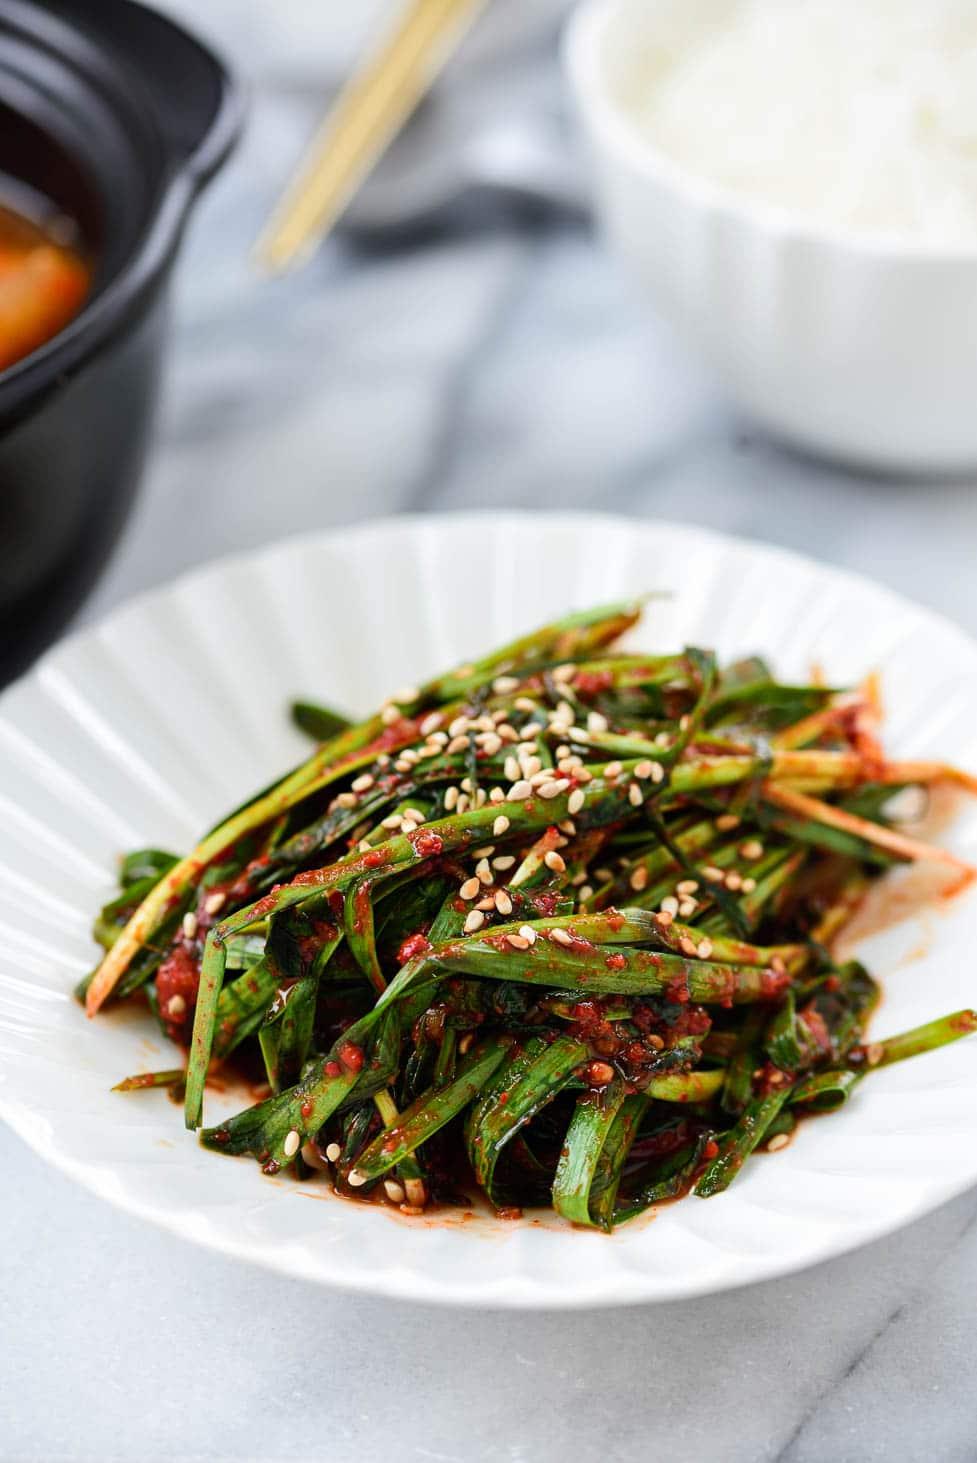 DSC7290 3 - A Korean Mom's Cooking